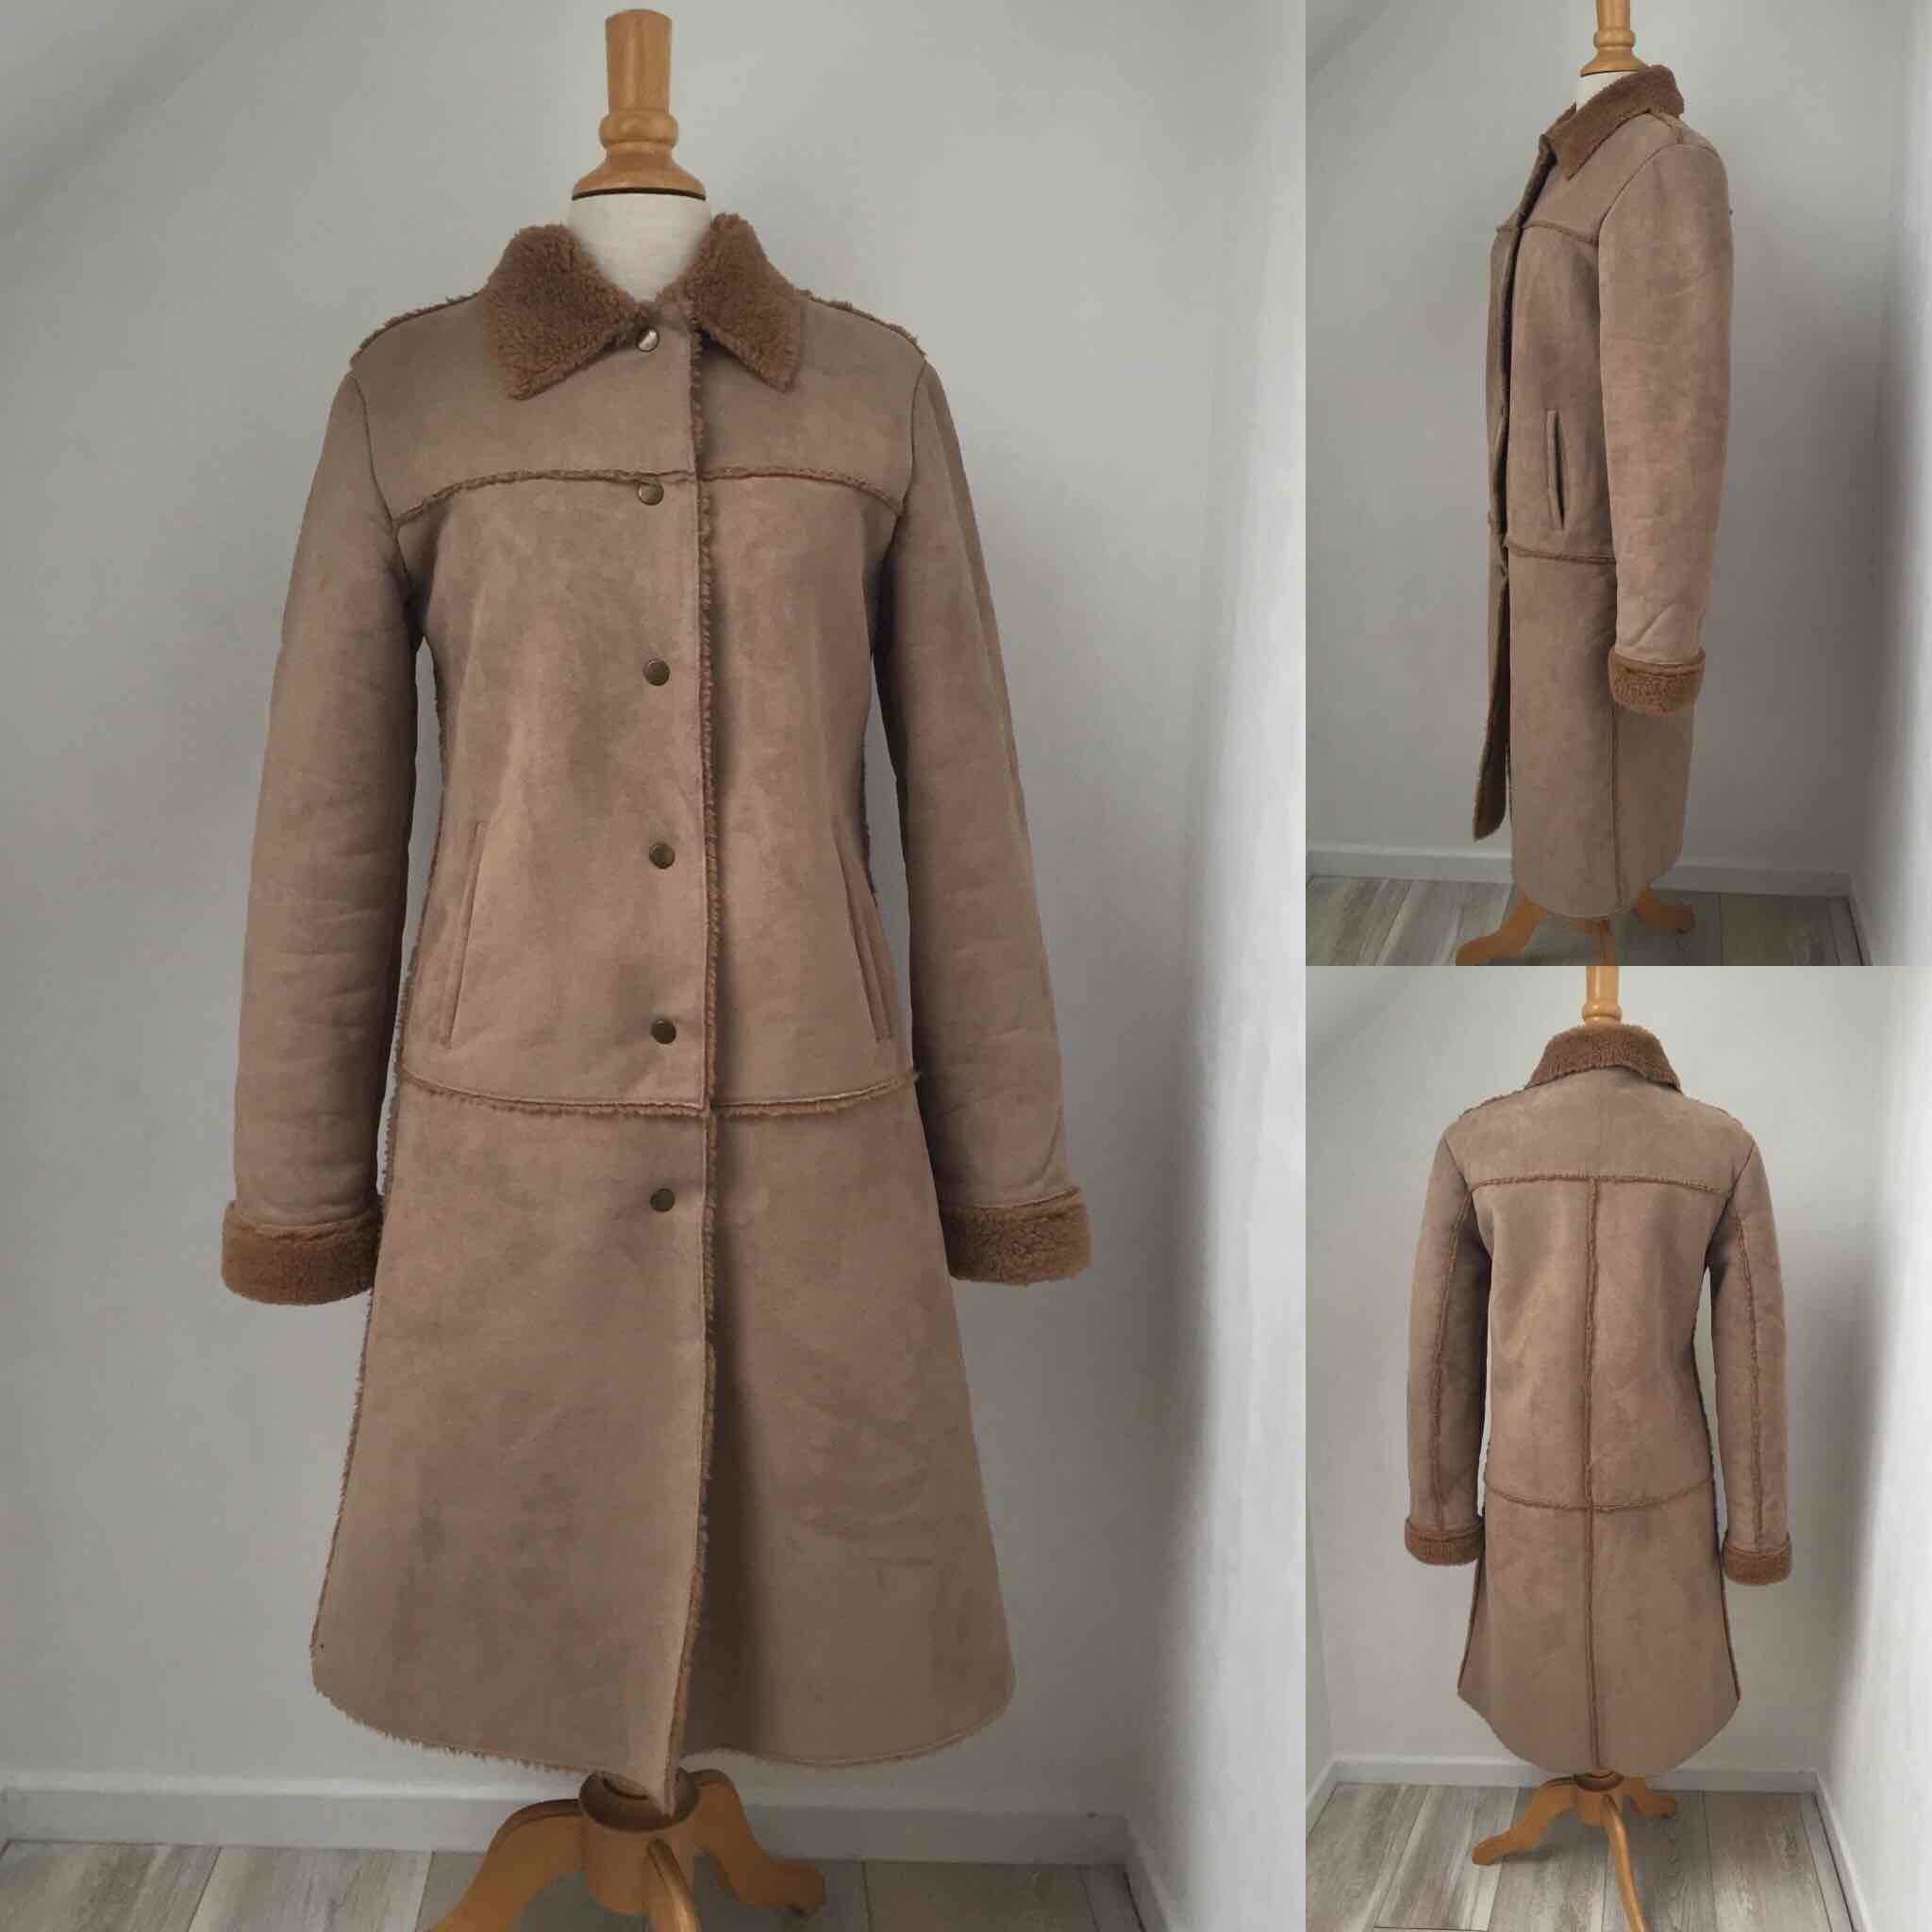 Manteau imitation peau lainée